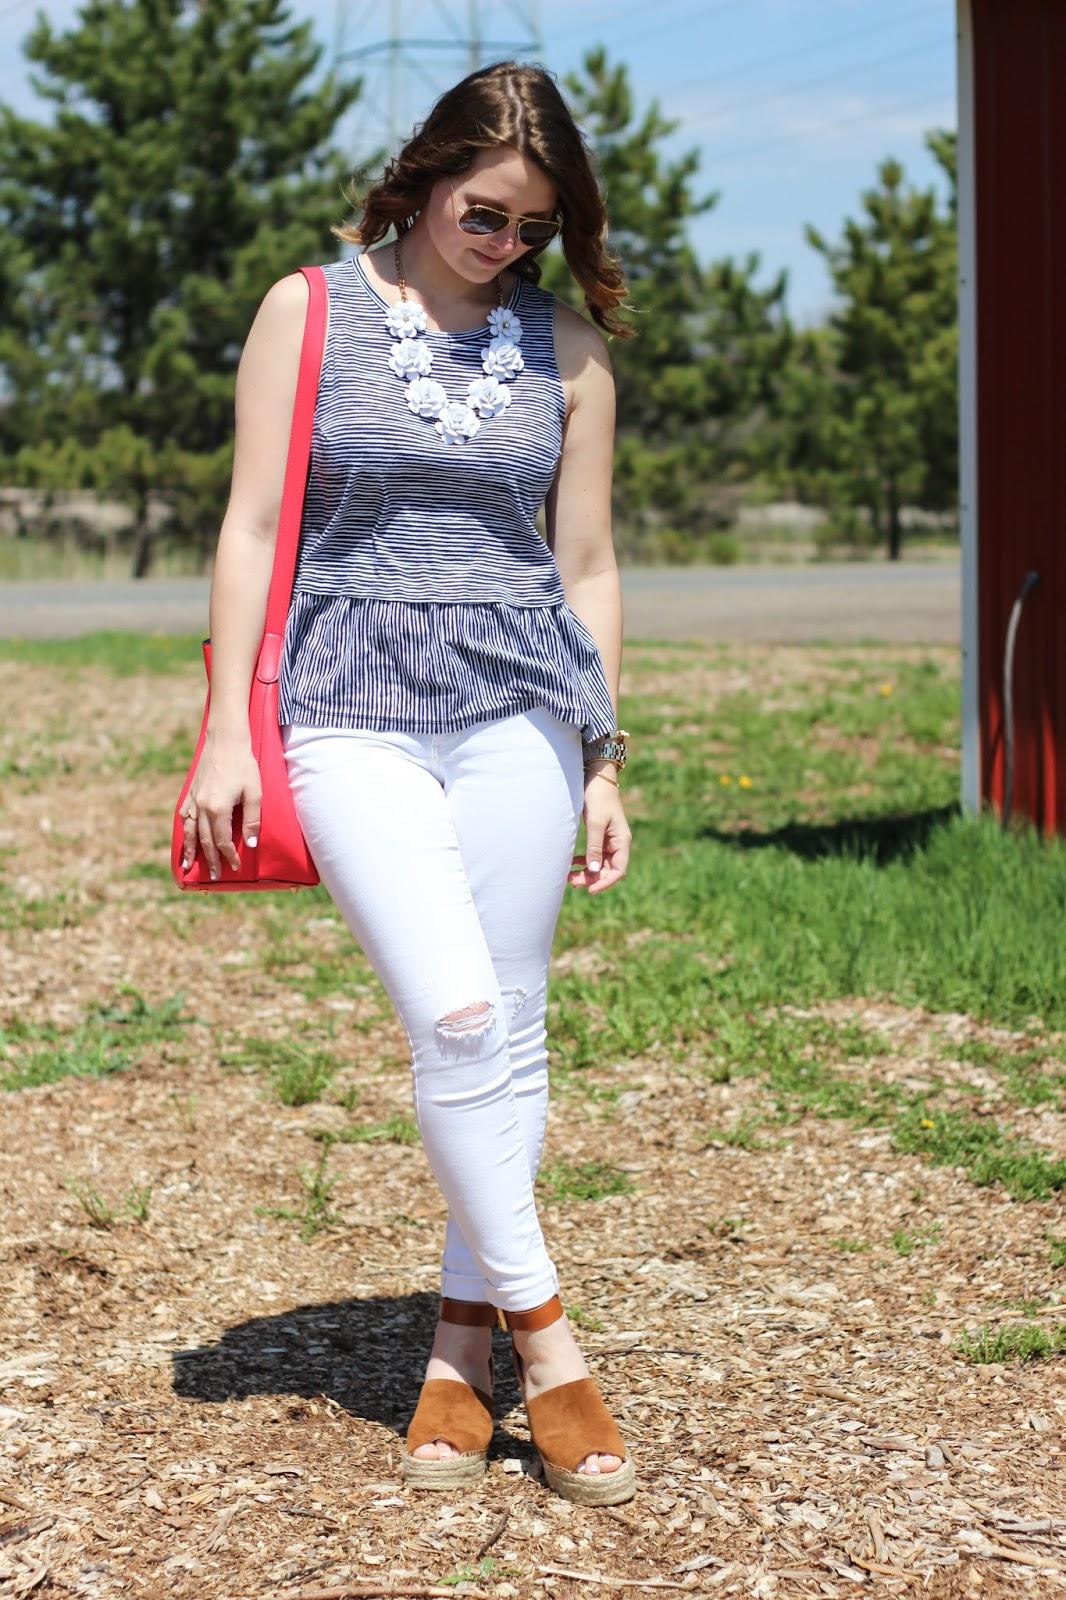 44c19612ecf516 ... BP Distressed High Waist Skinny Jeans | Marc Fisher LTD 'Adalyn'  Espadrille Wedge Sandal | J.Crew Crystal Floral Burst Necklace | Baublebar  'Spyda' Cuff ...